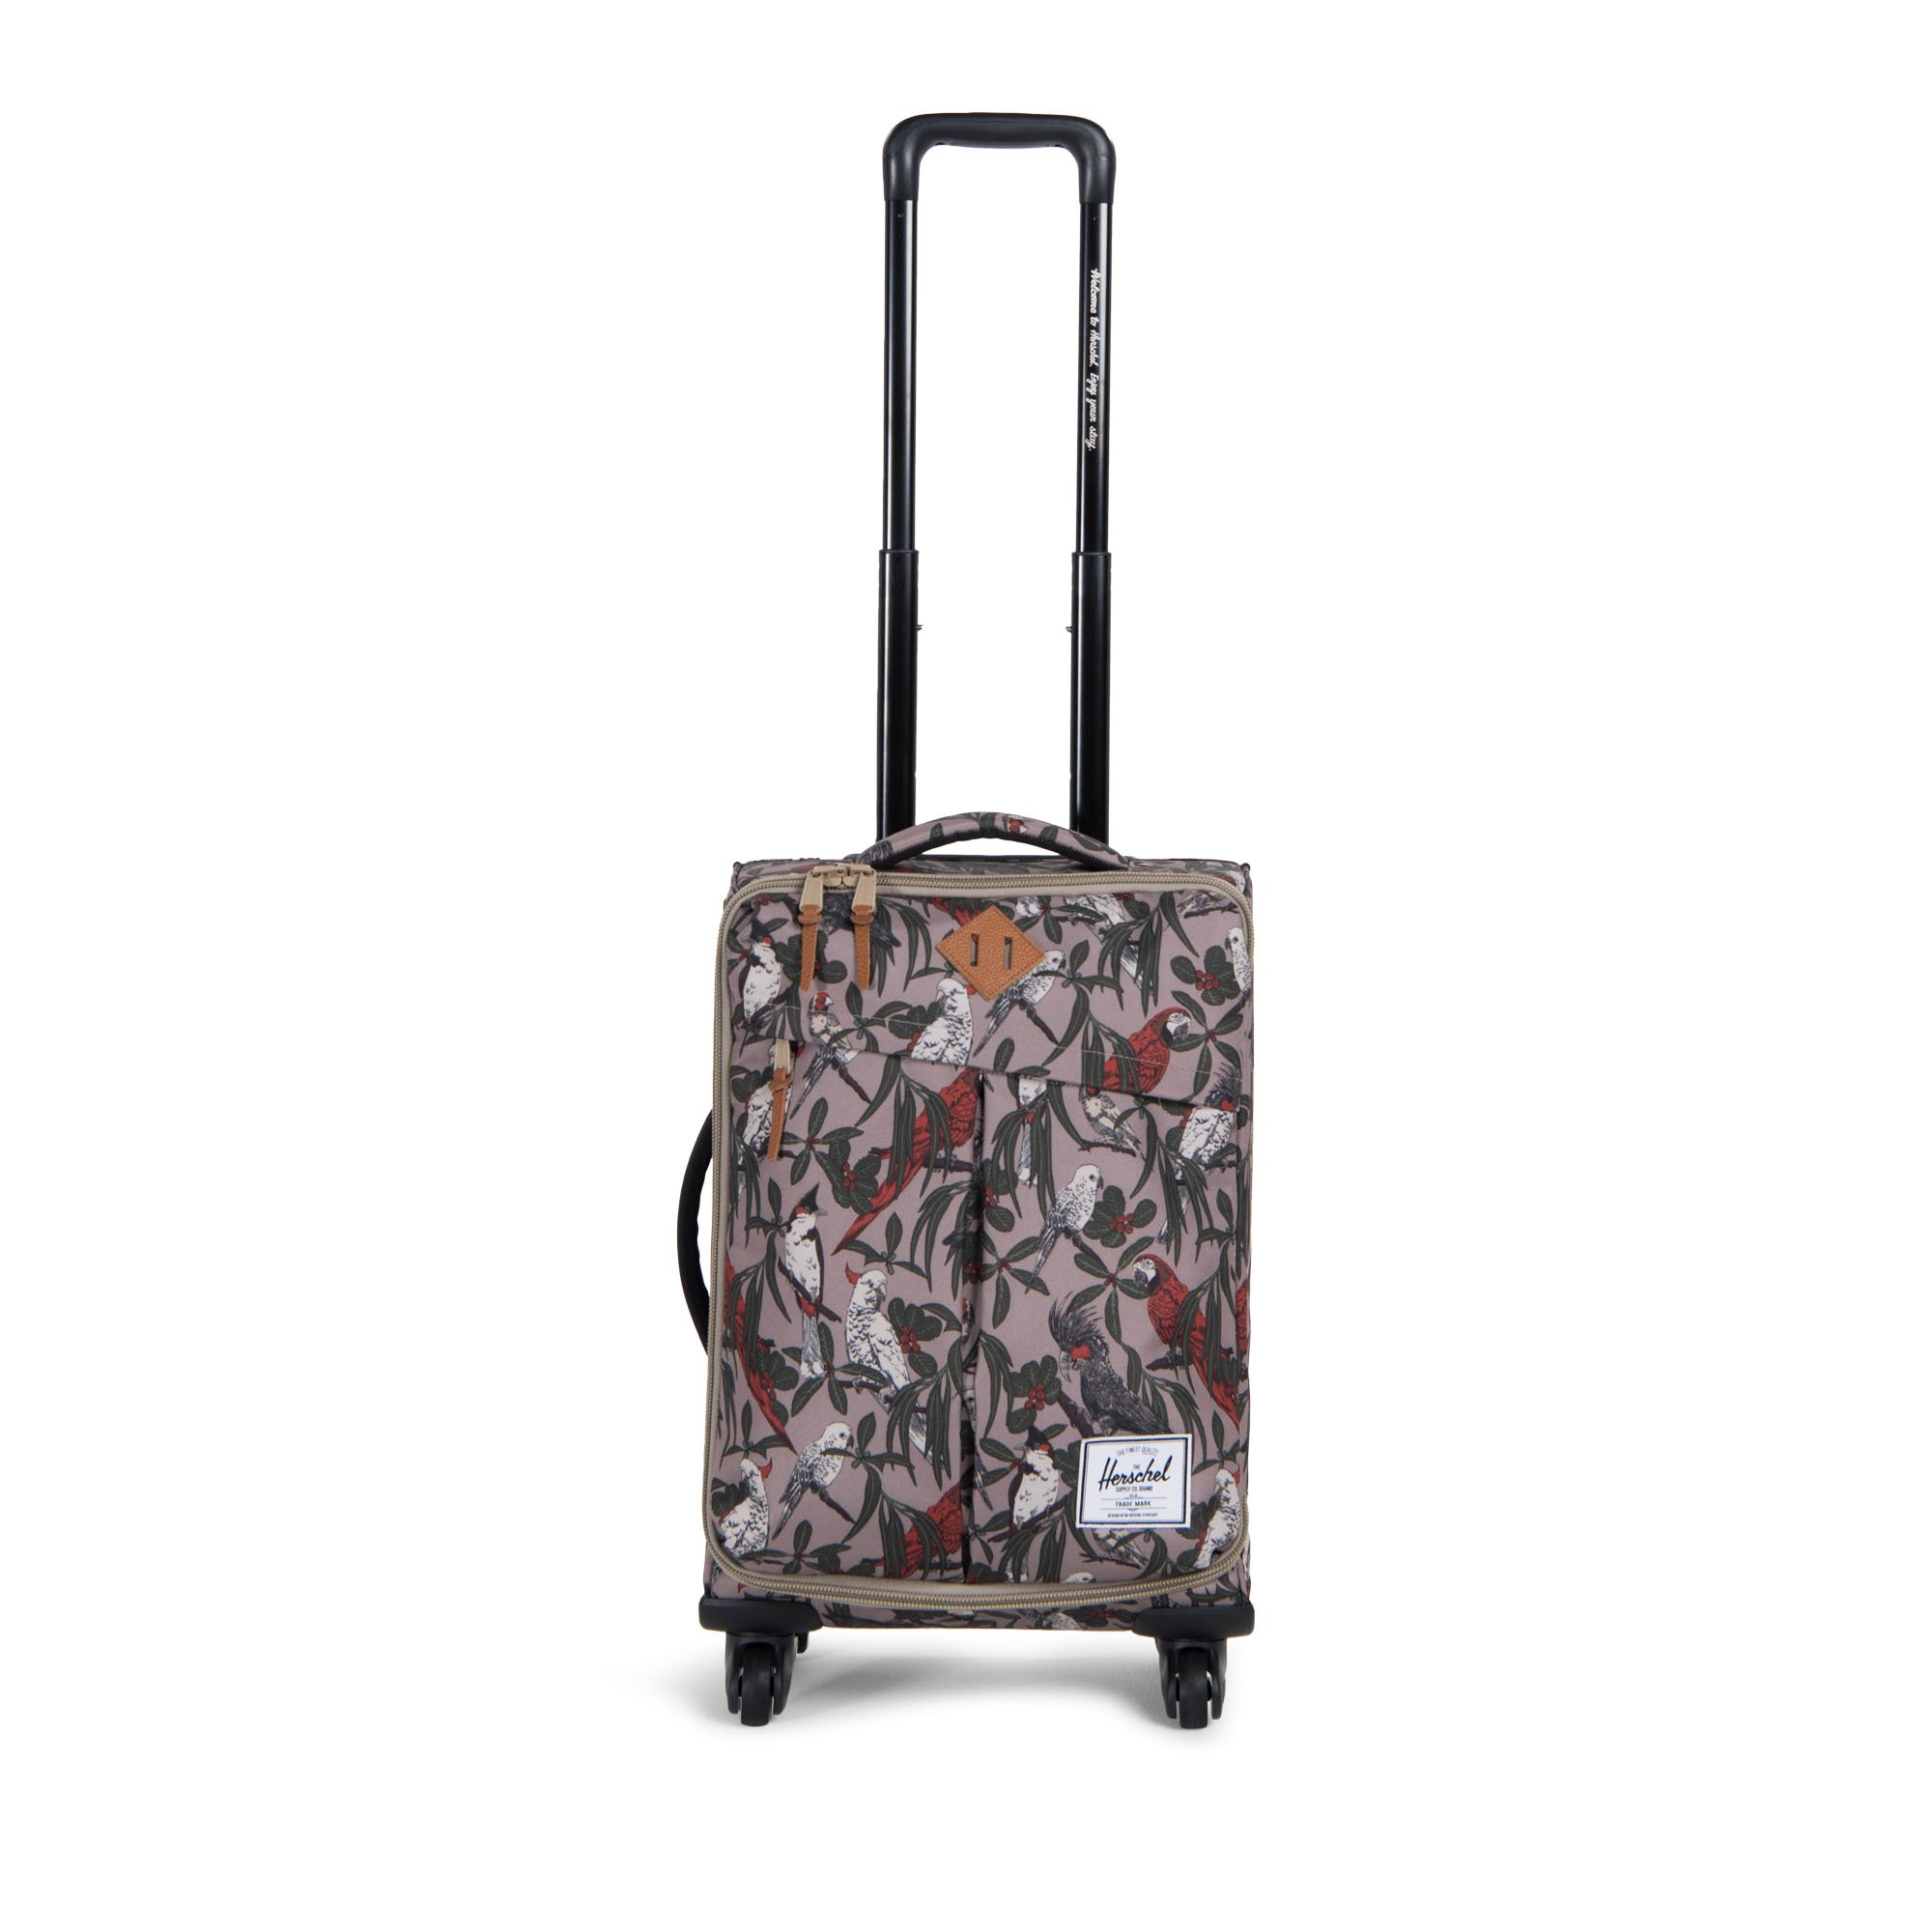 Herschel Supply Co. Highland Softside Luggage, Brindle Parlour by Herschel Supply Co.